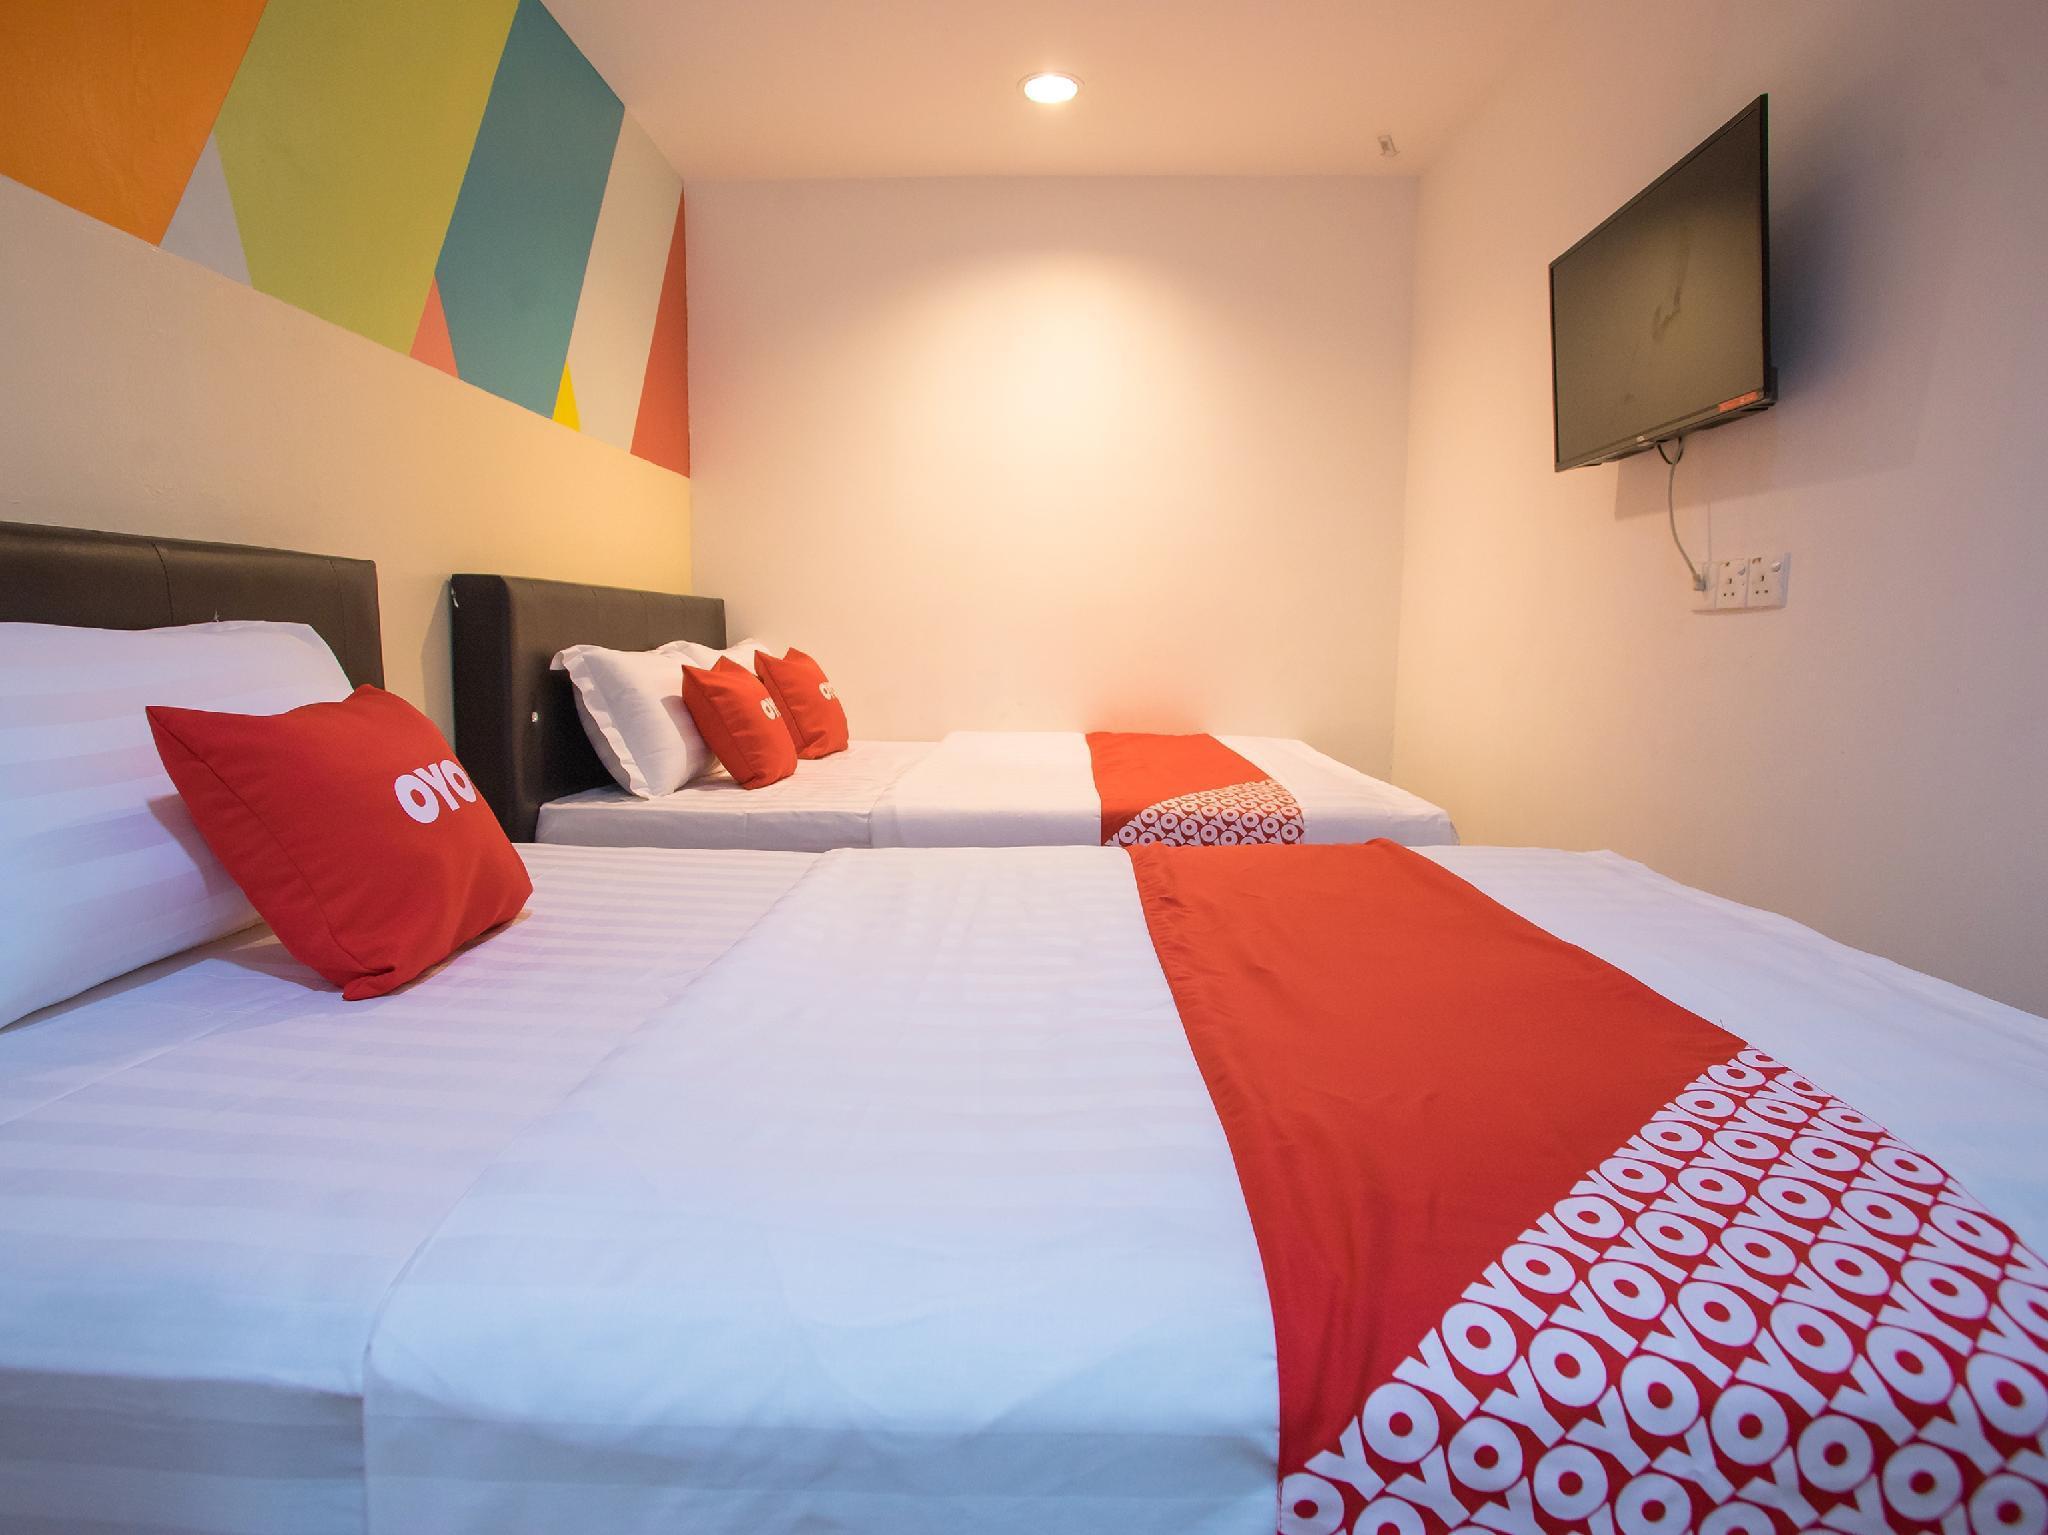 OYO 89450 Hotel Taj Inn Seksyen 13